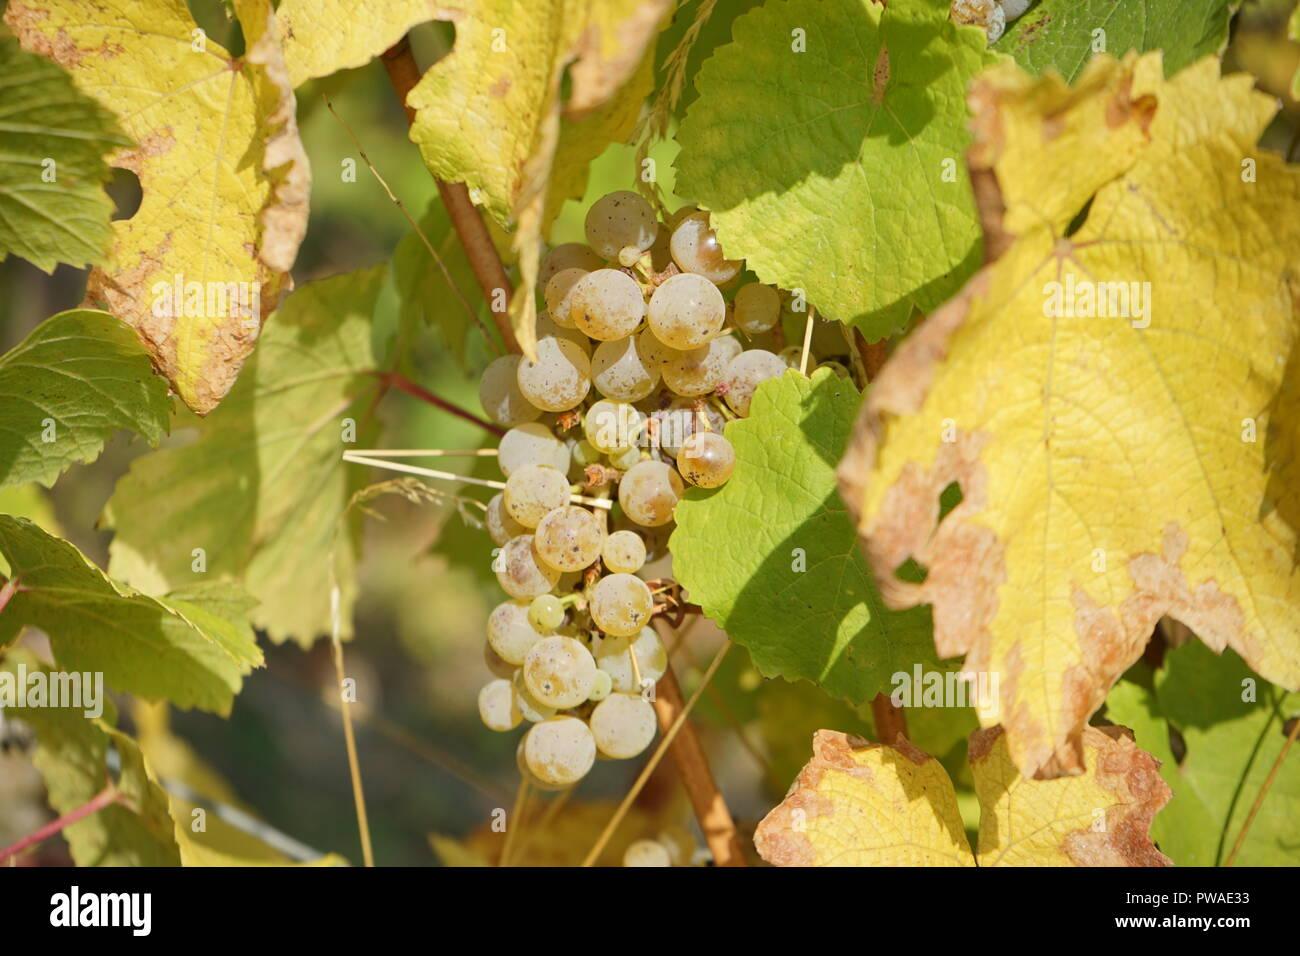 Rieslingtrauben, Edle Weinrebe (Vitis vinifera subsp. vinifera), Moseltal, Deutschland, Europa Stock Photo